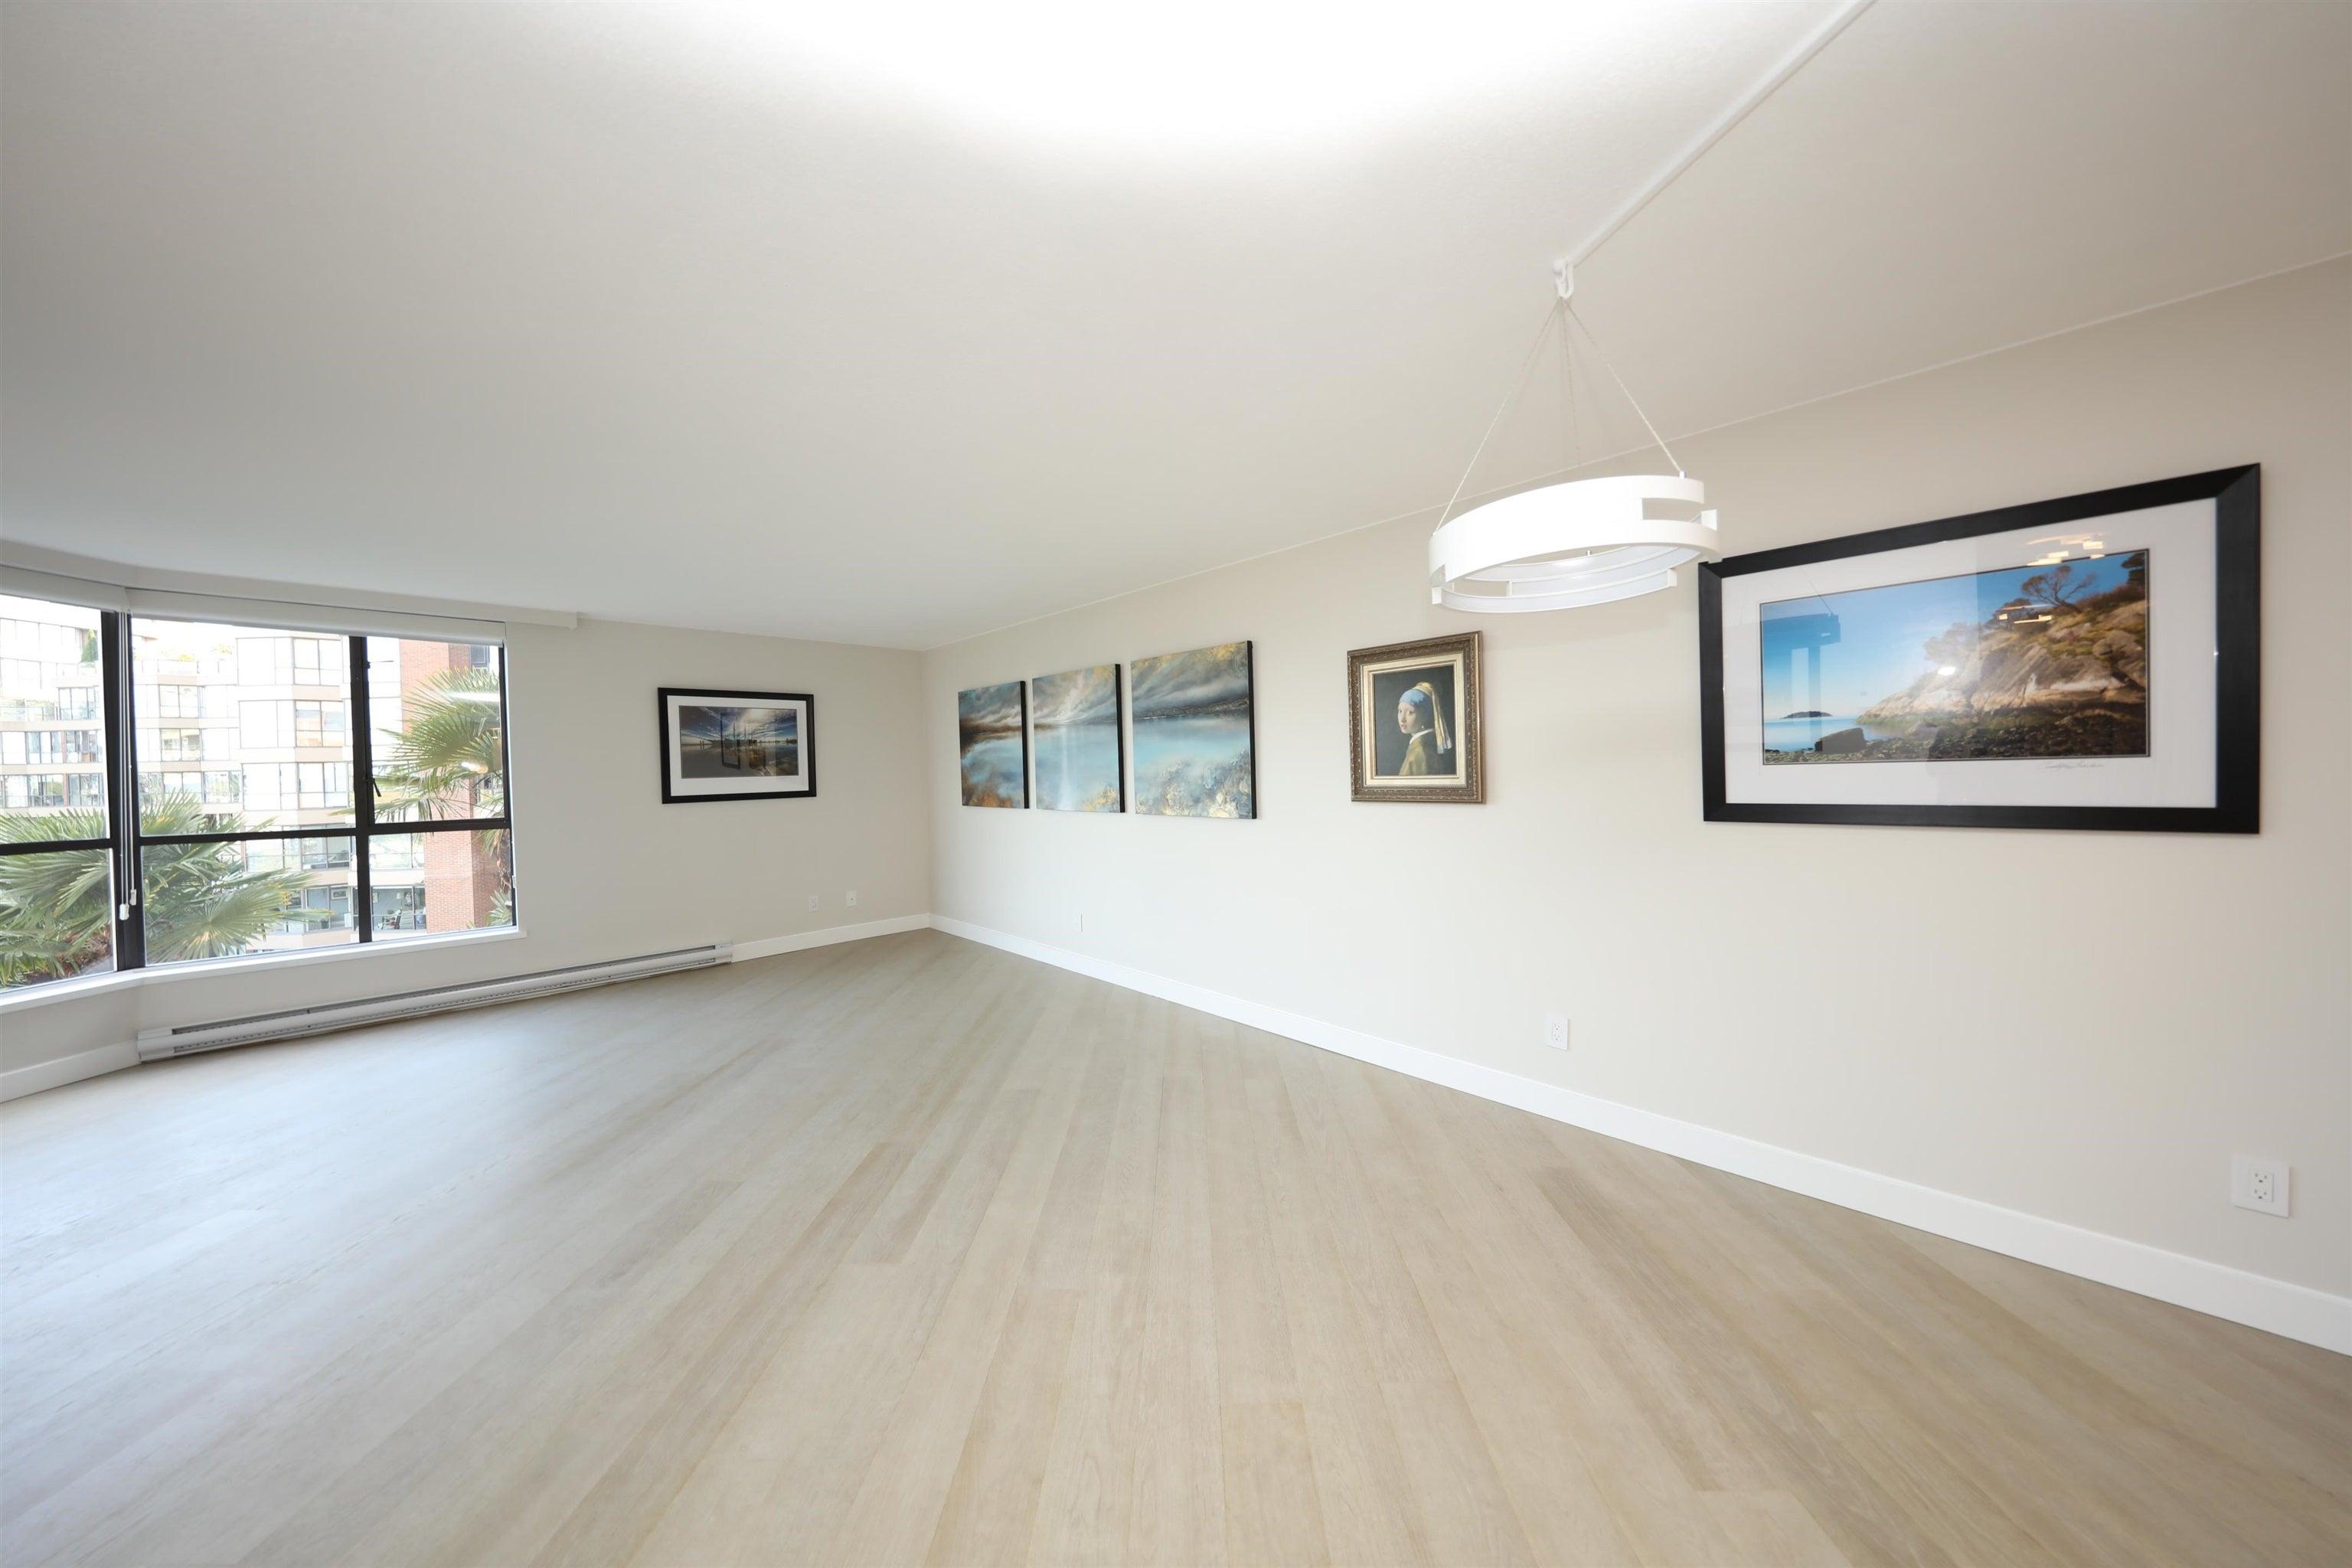 406 1450 PENNYFARTHING DRIVE - False Creek Apartment/Condo for sale, 2 Bedrooms (R2617259) - #2